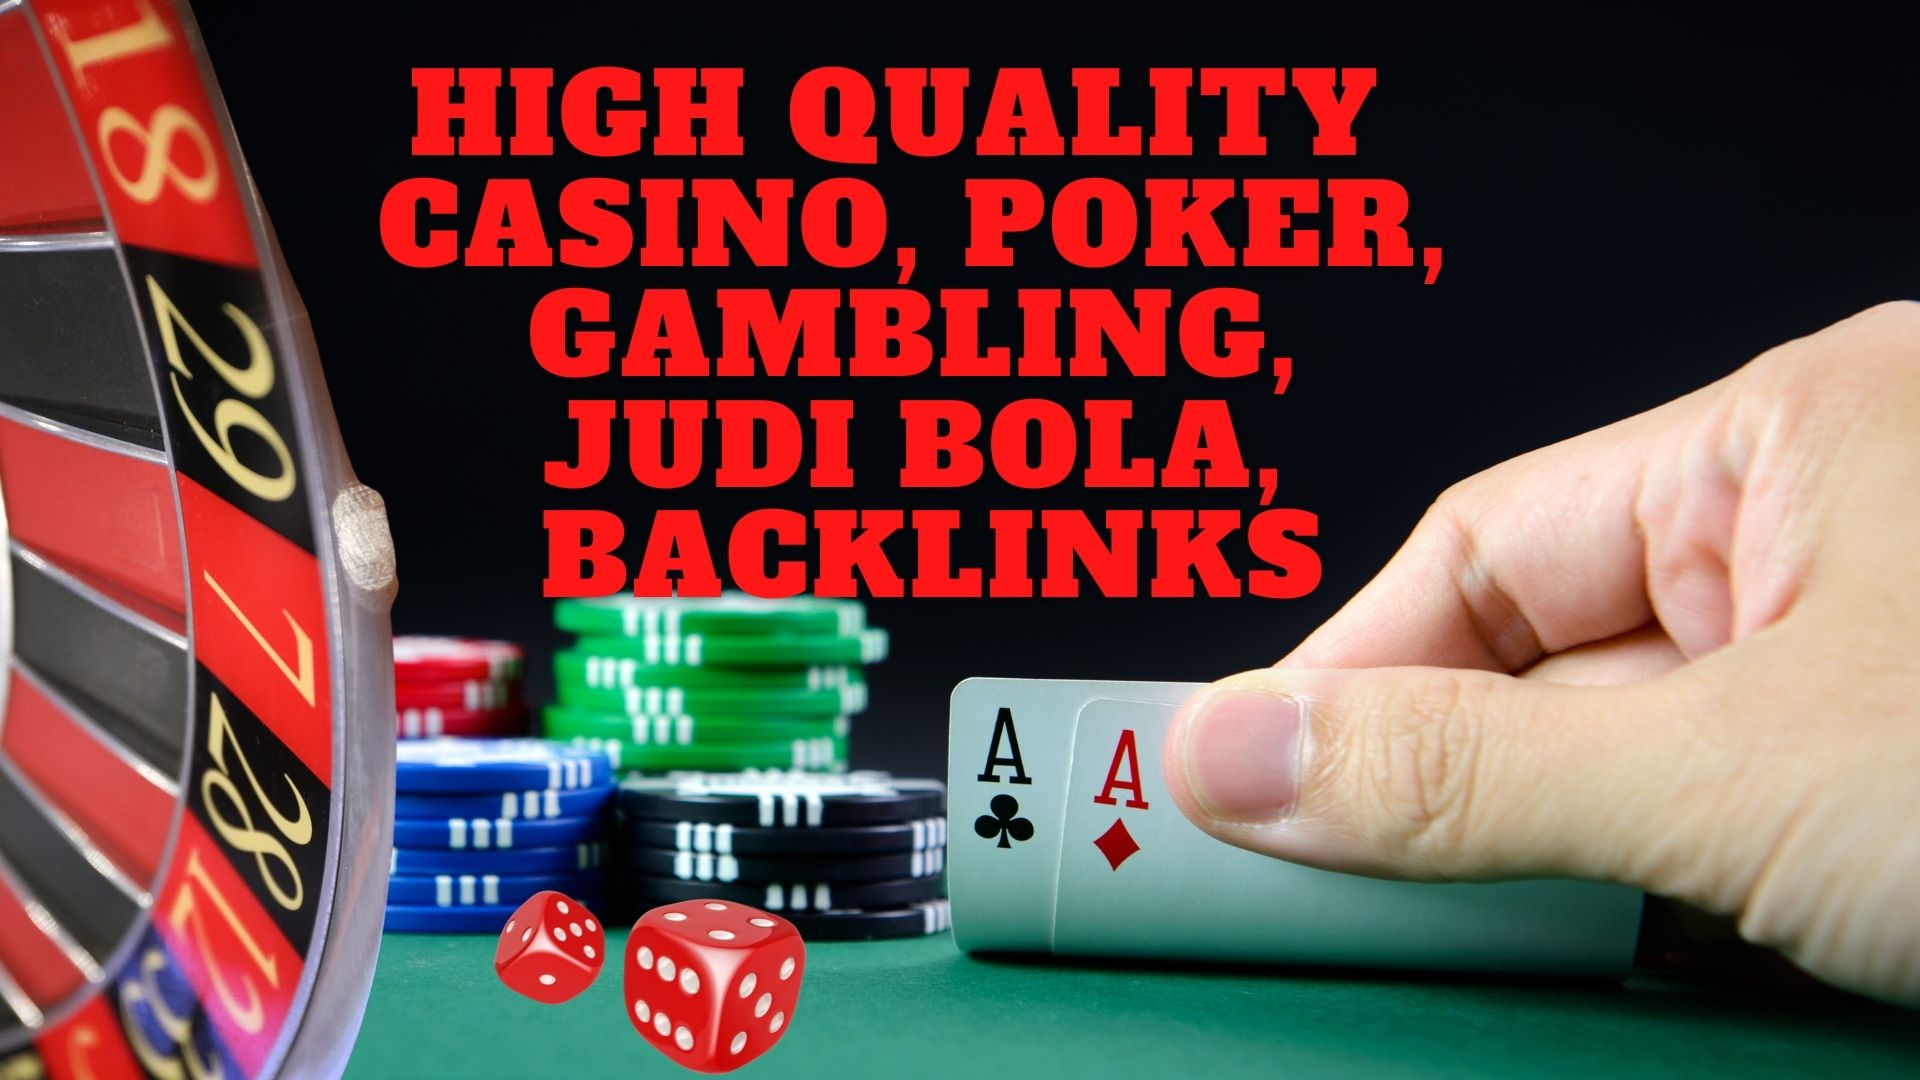 High Quality 1999+ CASINO,  Poker,  Gambling,  Judi bola,  Backlinks With DA70+ DR60+ Homepage